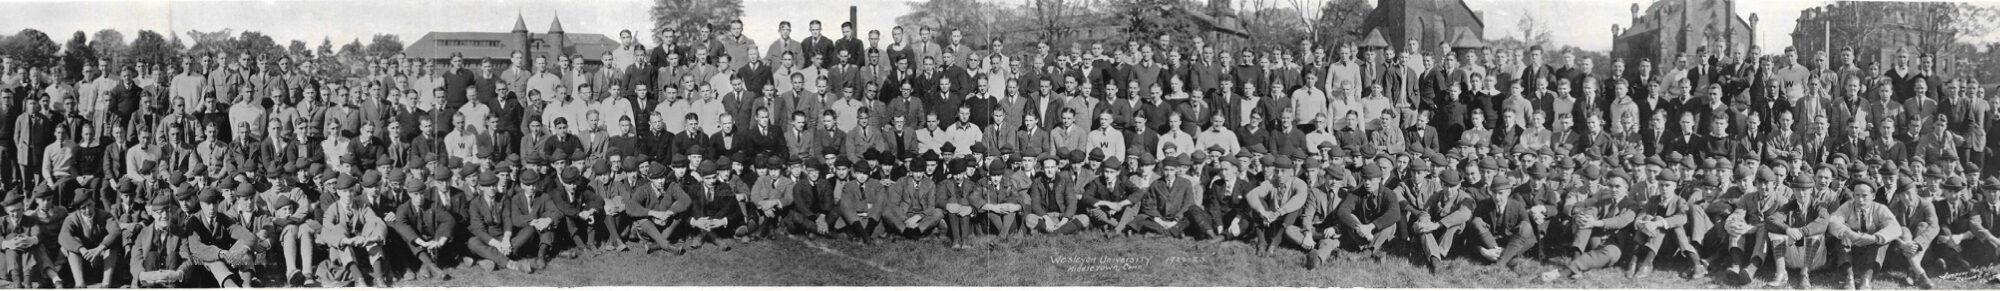 Wesleyan University 1922-1923